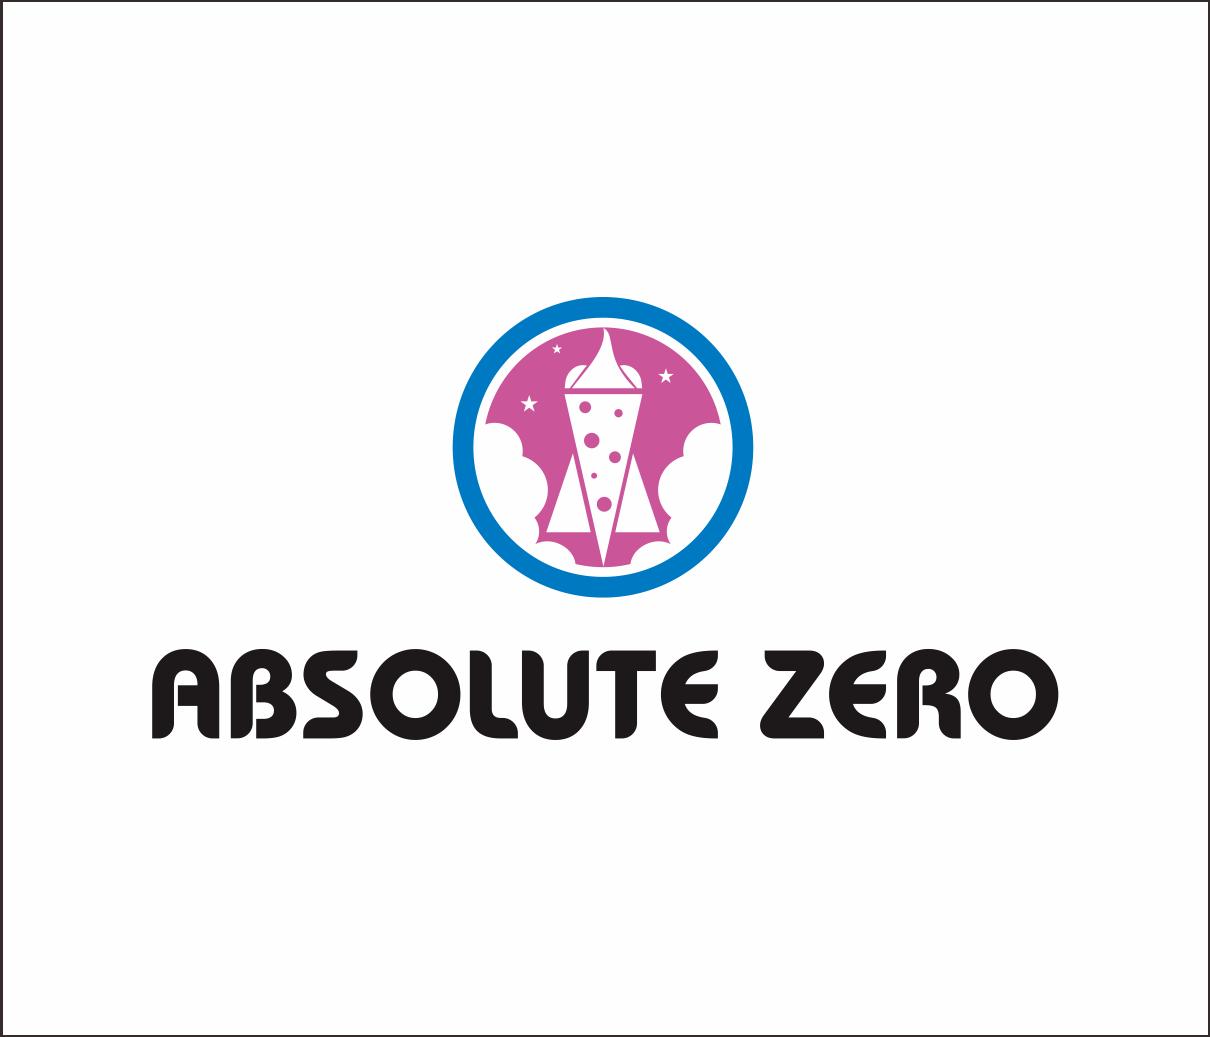 Logo Design by Armada Jamaluddin - Entry No. 51 in the Logo Design Contest Imaginative Logo Design for Absolute Zero.